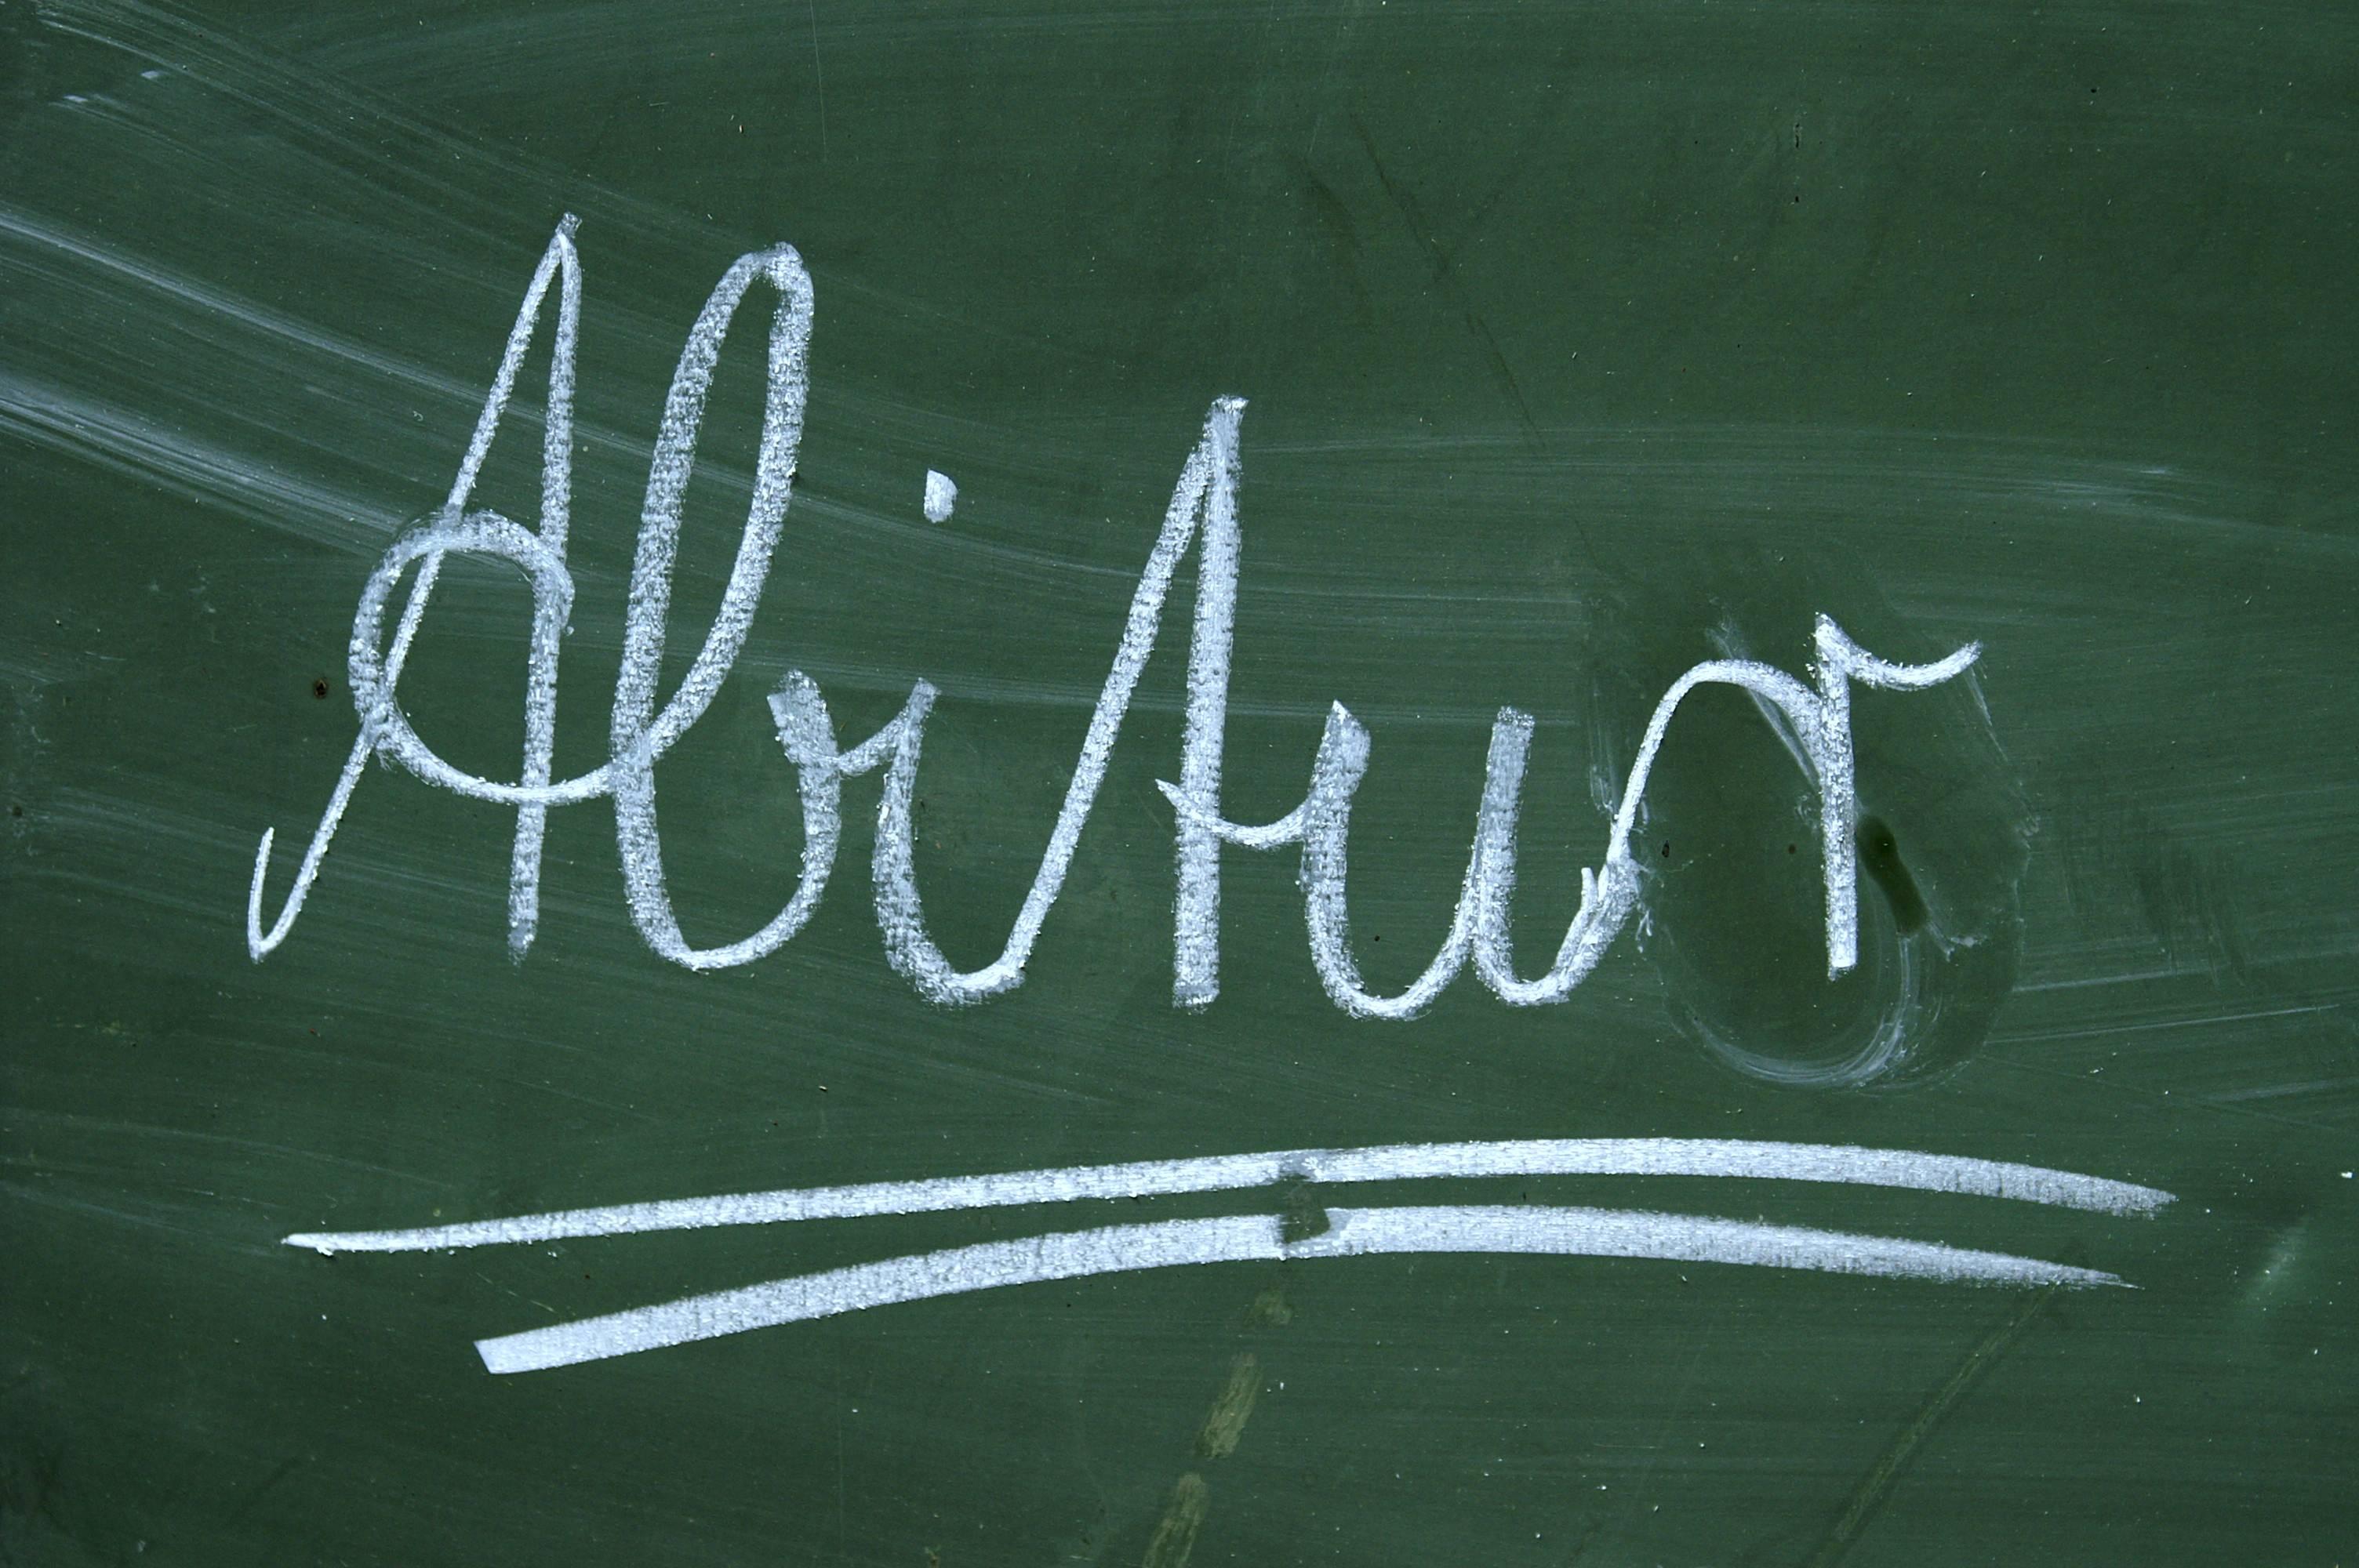 Ist das Abitur das Maß aller Dinge? Foto: S. Hofschlaeger / pixelio.de